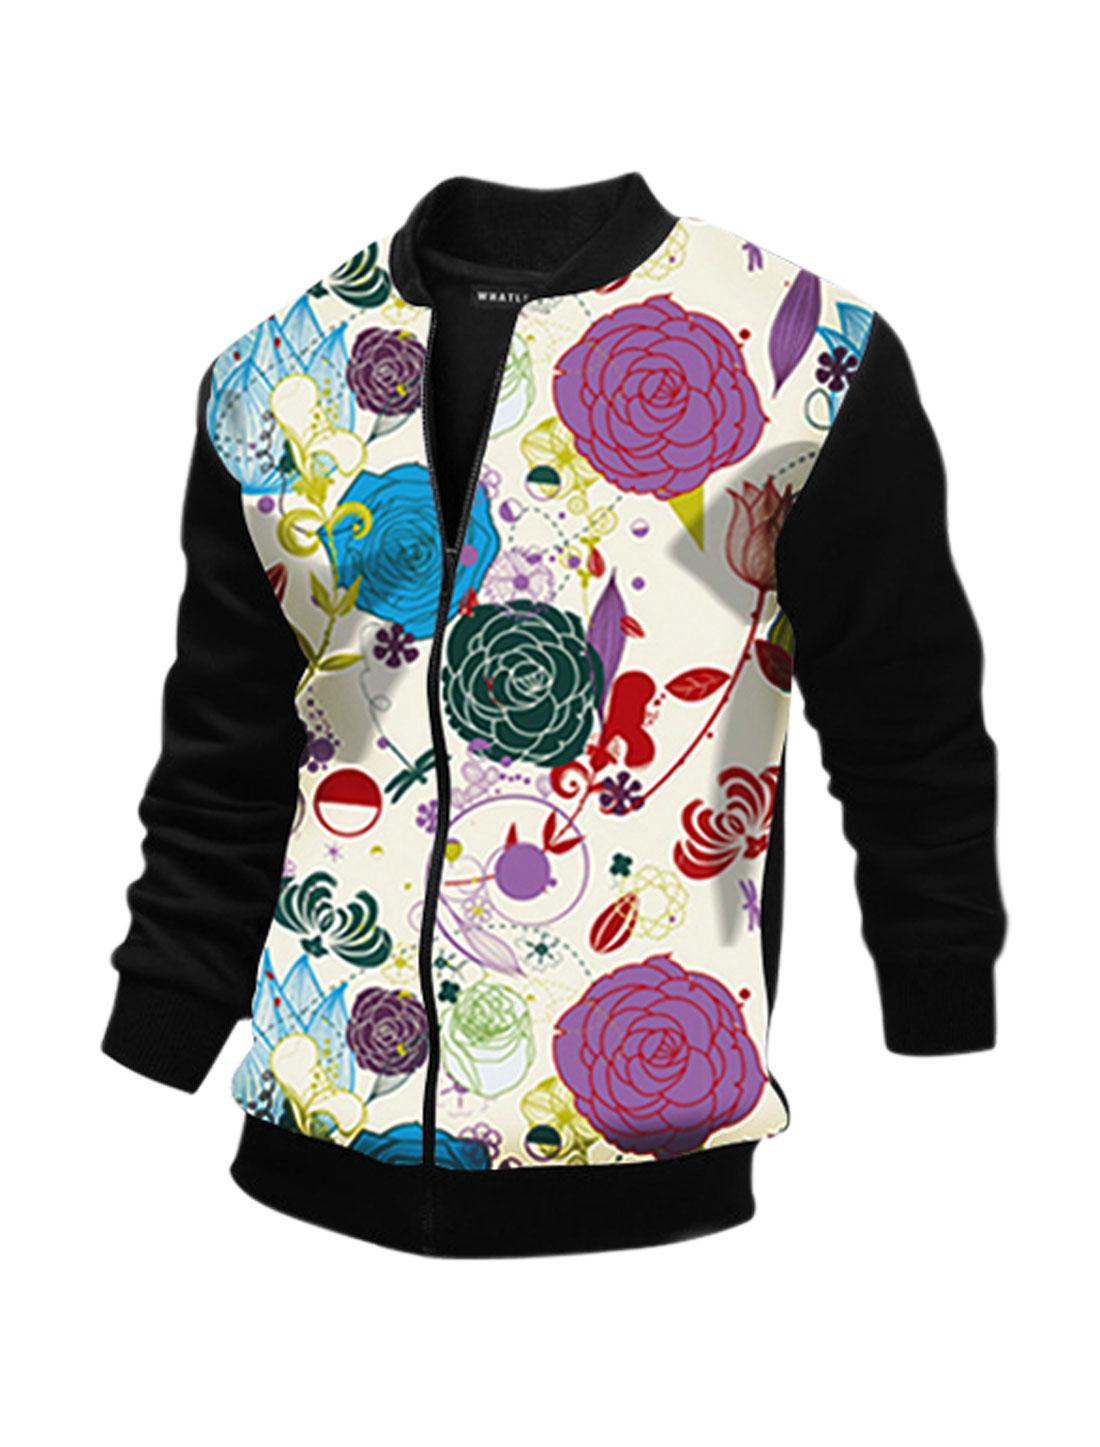 Men Long Sleeves Stand Collar Zip Closure Floral Jacket Black M